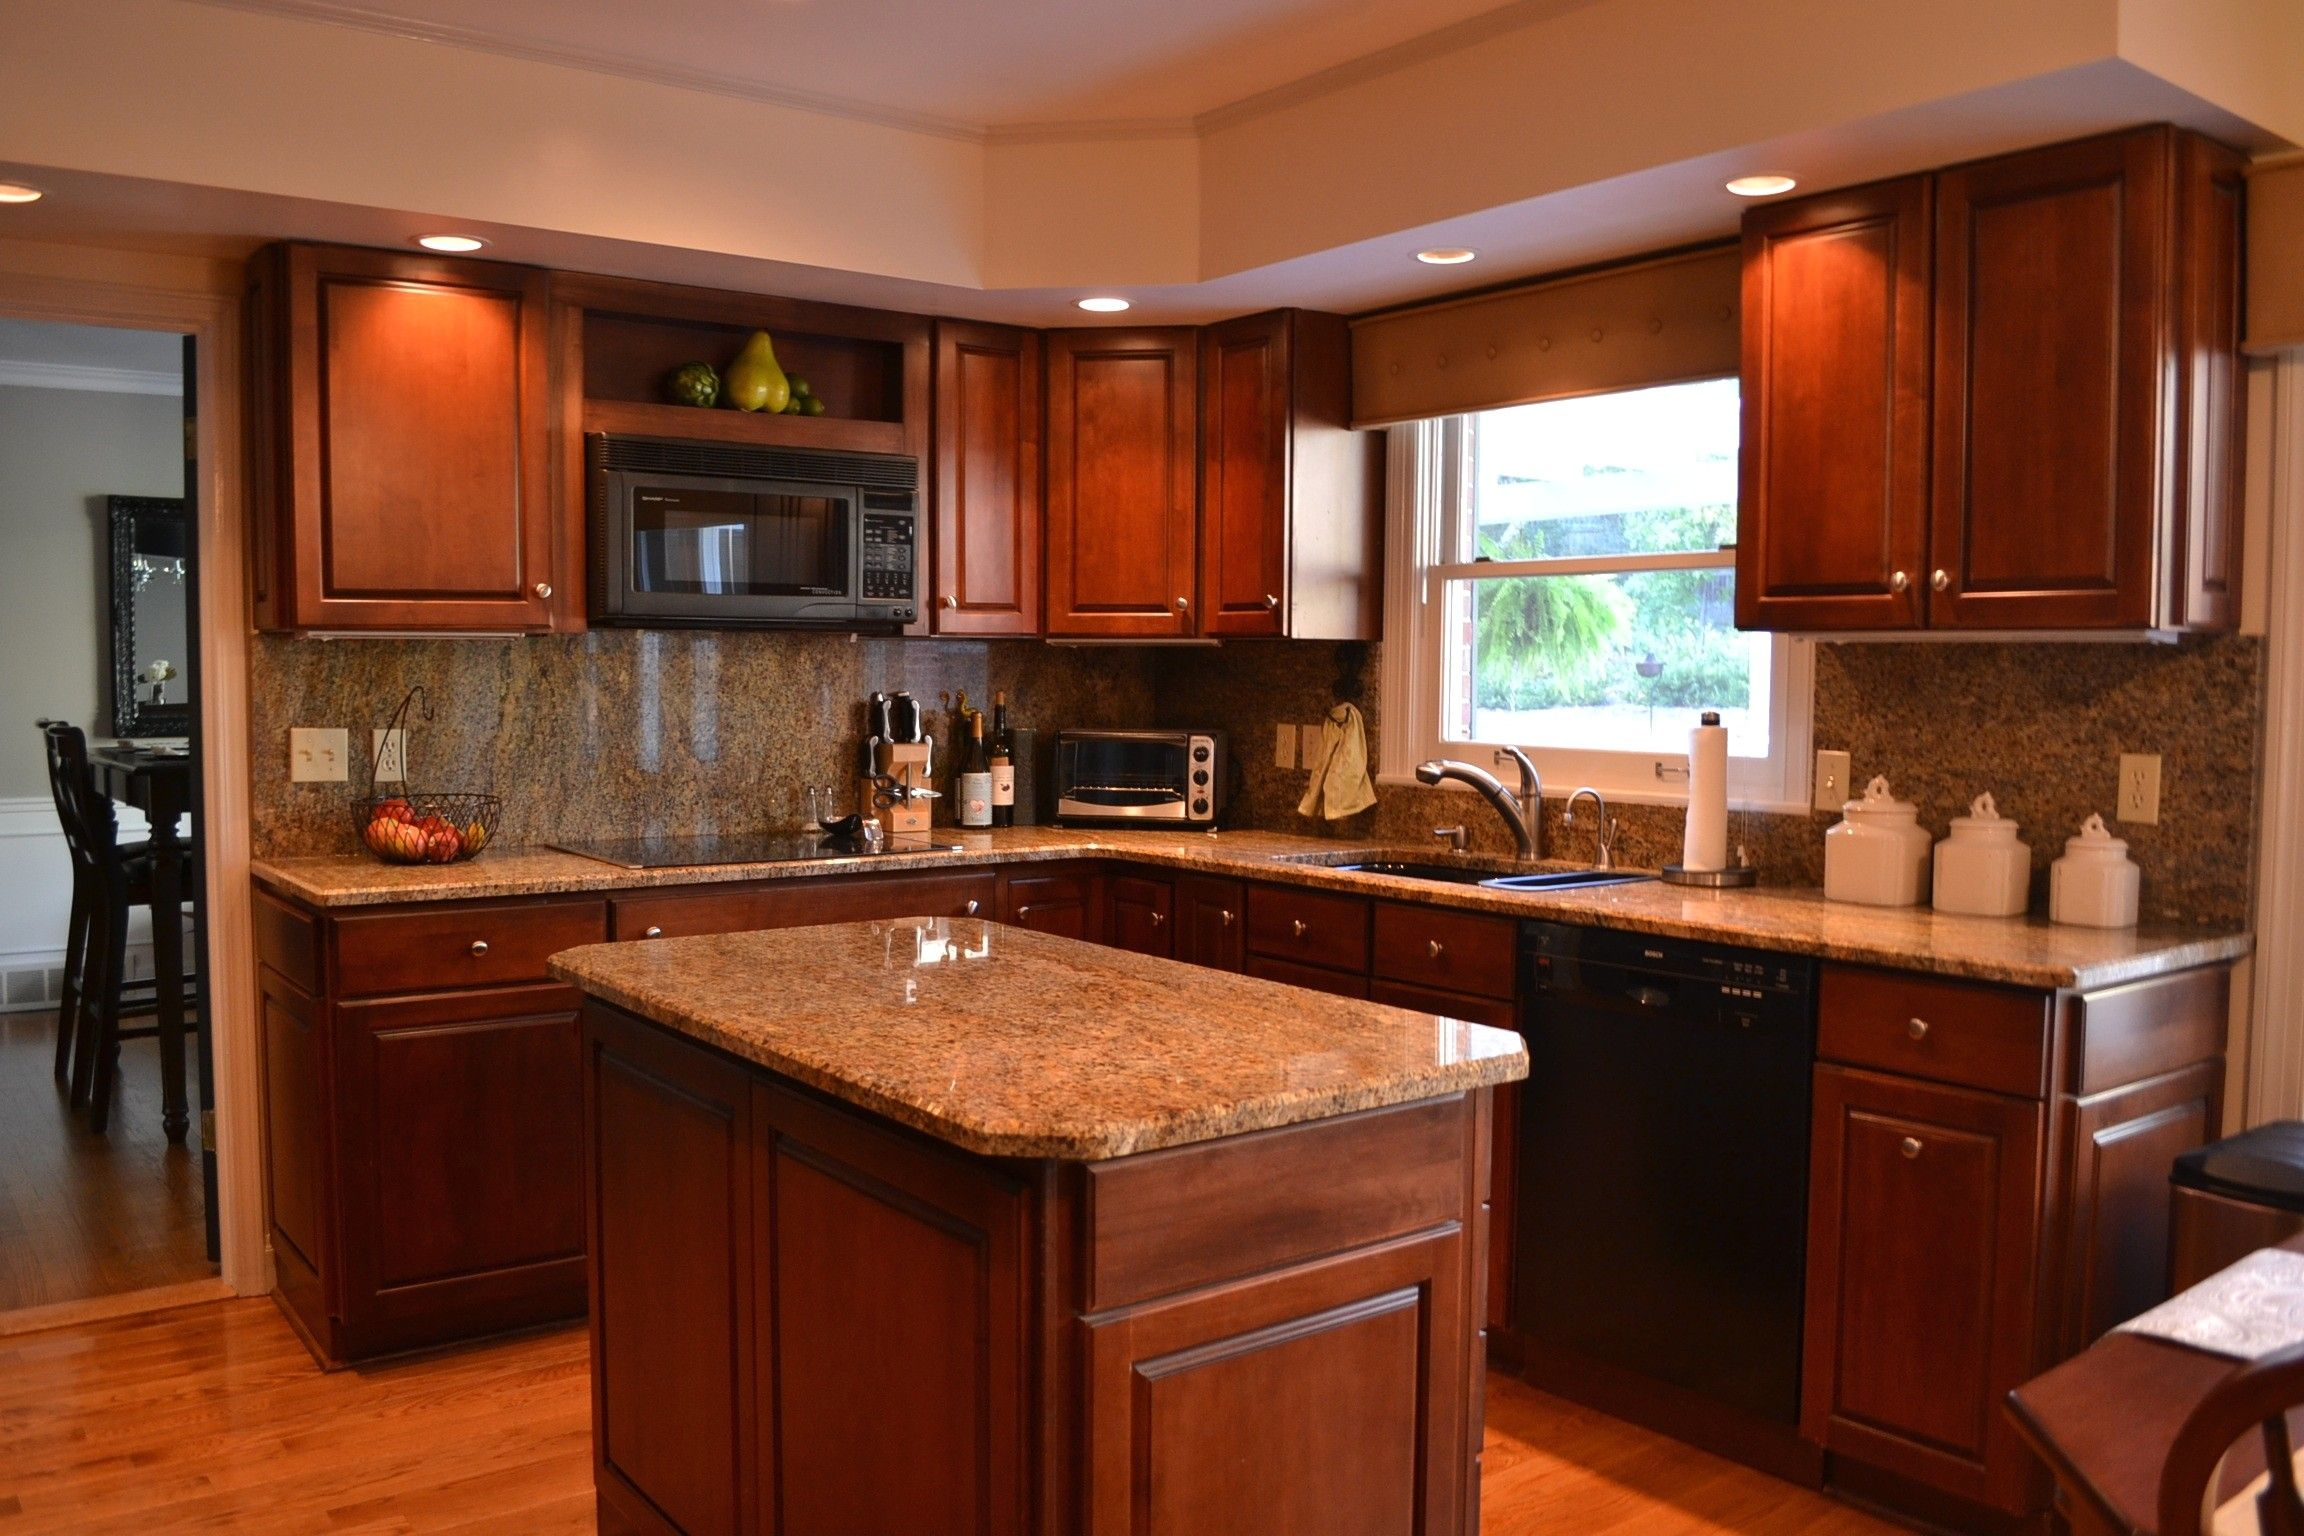 kitchen cabinet countertop color combinations kitchen cabinets color combination Cabinet Countertop Color Combinations Google Search Home Decor Kitchen Cabinet Countertop Color Combinations